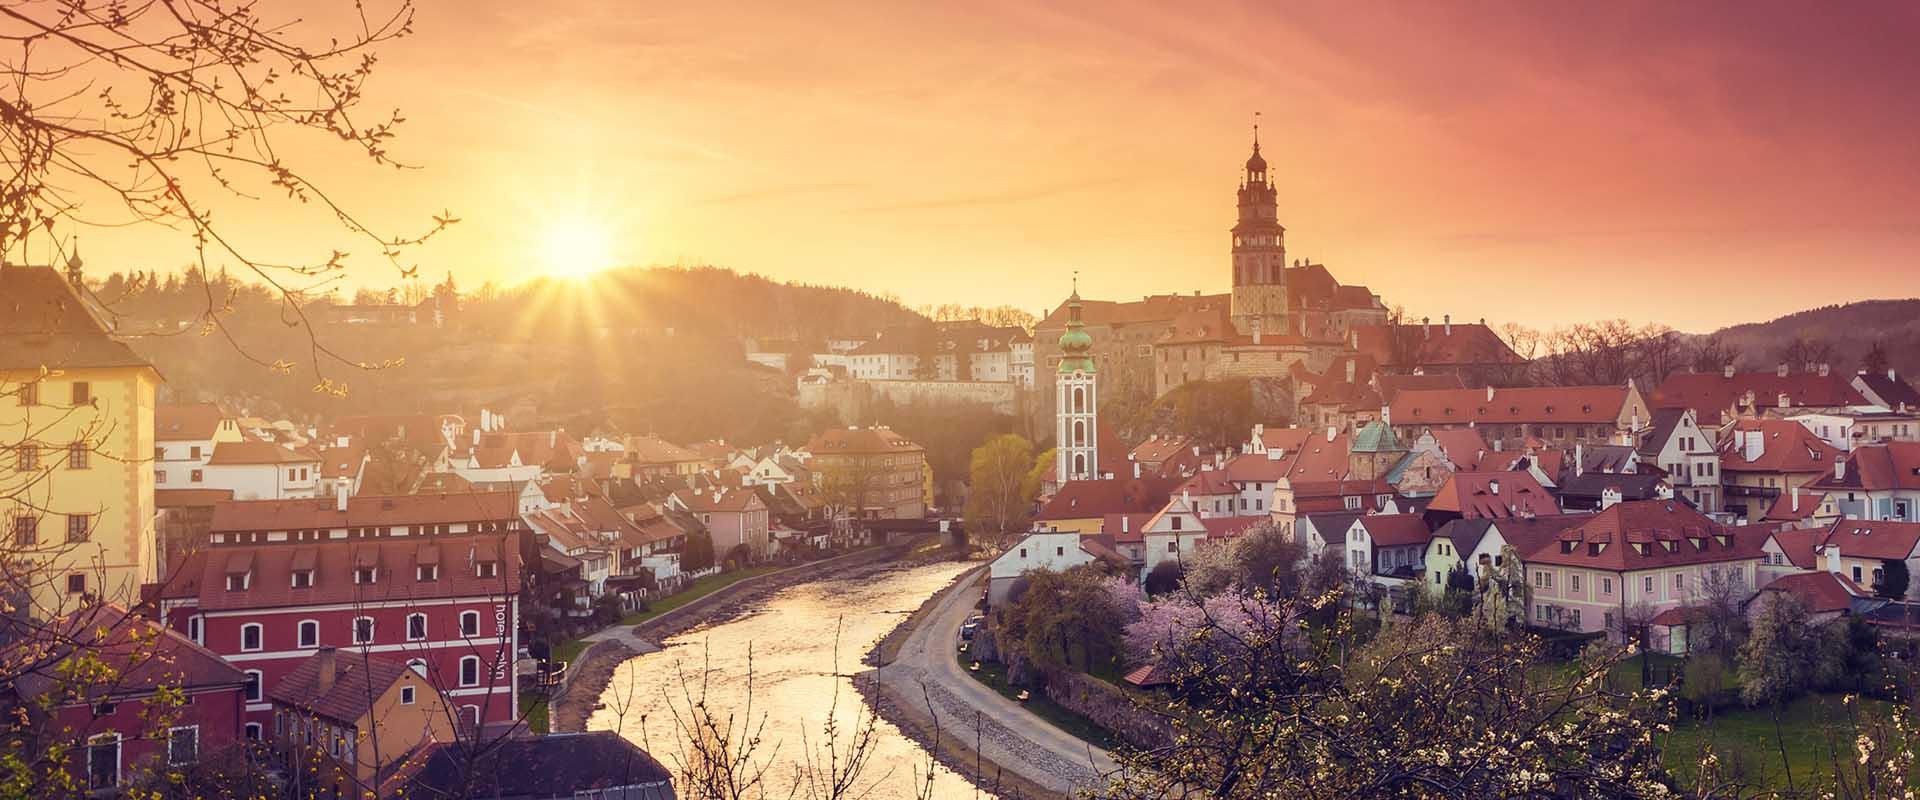 Czech Republic Public Holidays PublicHolidayscz